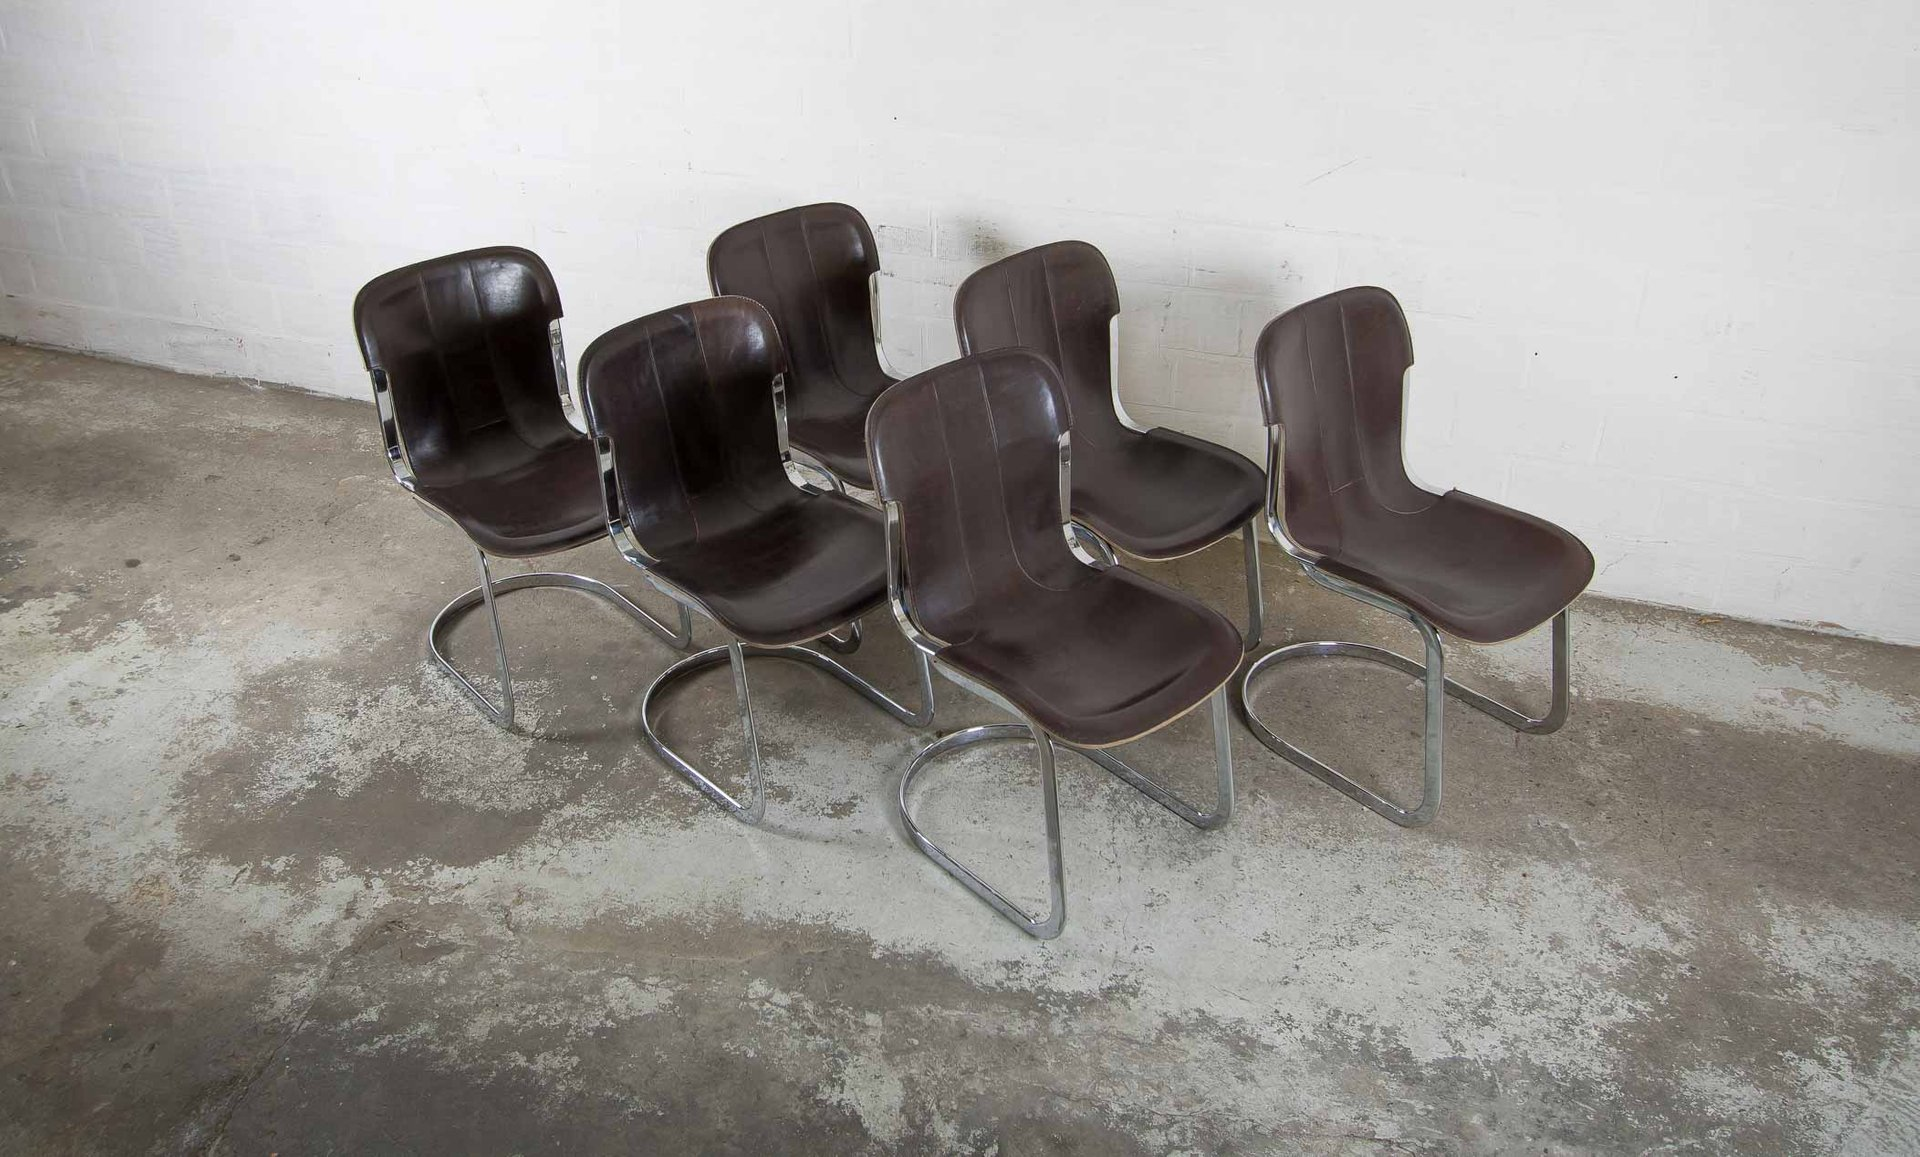 Sedie Vintage Pelle : Sedie vintage in metallo cromato e pelle di willy rizzo per cidue